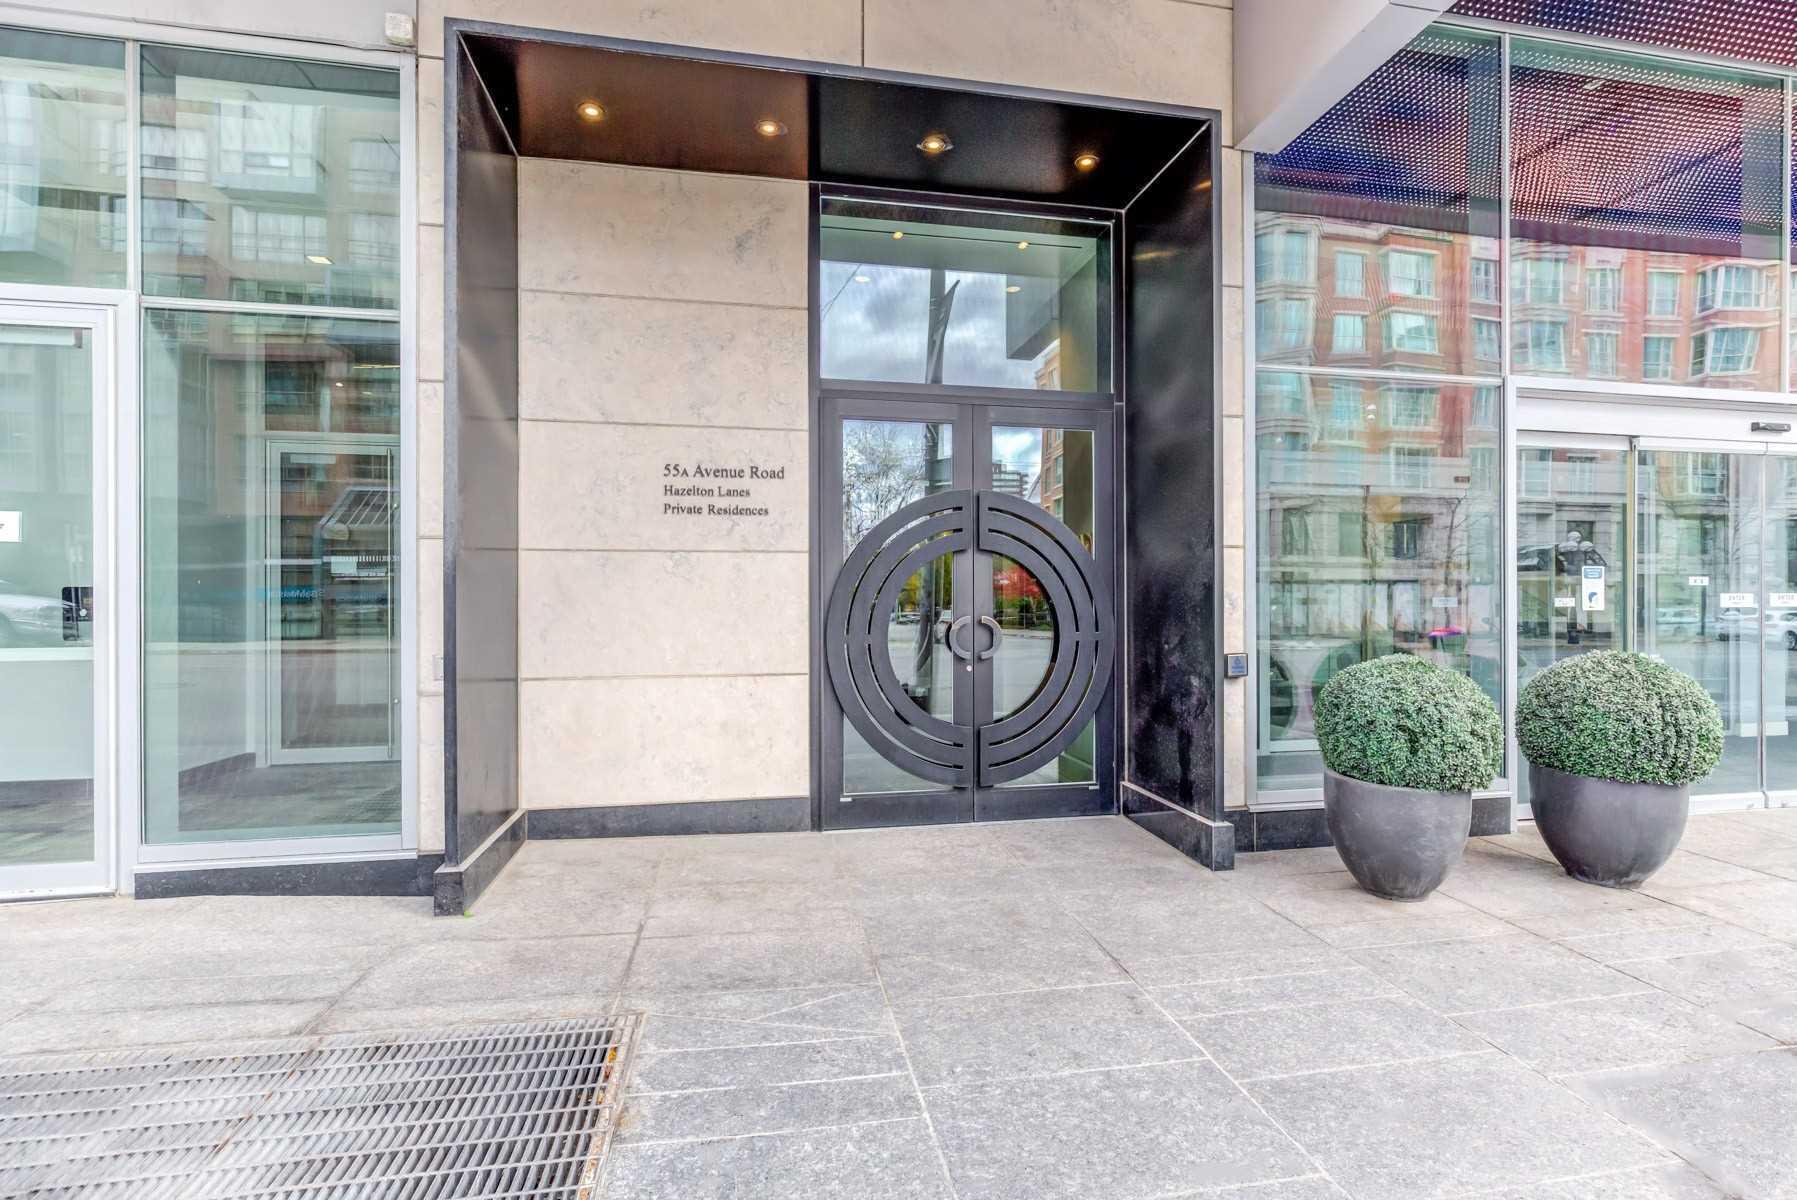 607 - 55A Avenue Rd - Annex Condo Apt for sale, 2 Bedrooms (C5185690) - #12